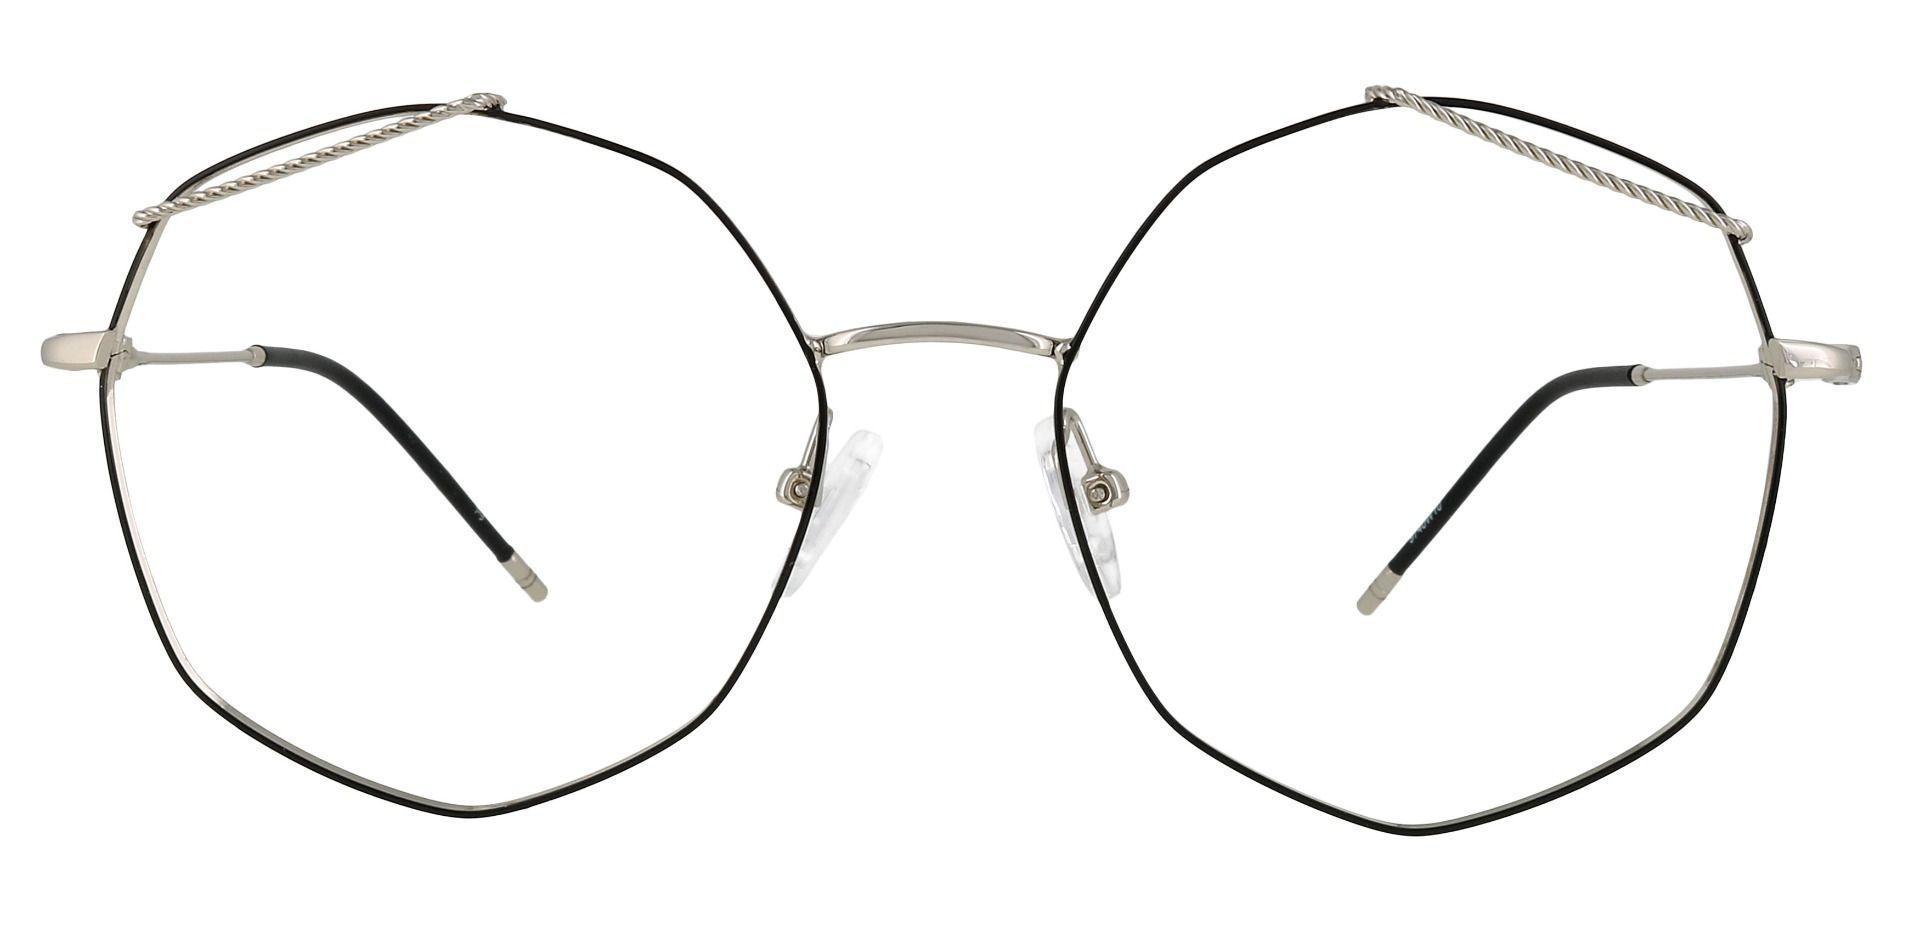 Tango Geometric Non-Rx Glasses - Black